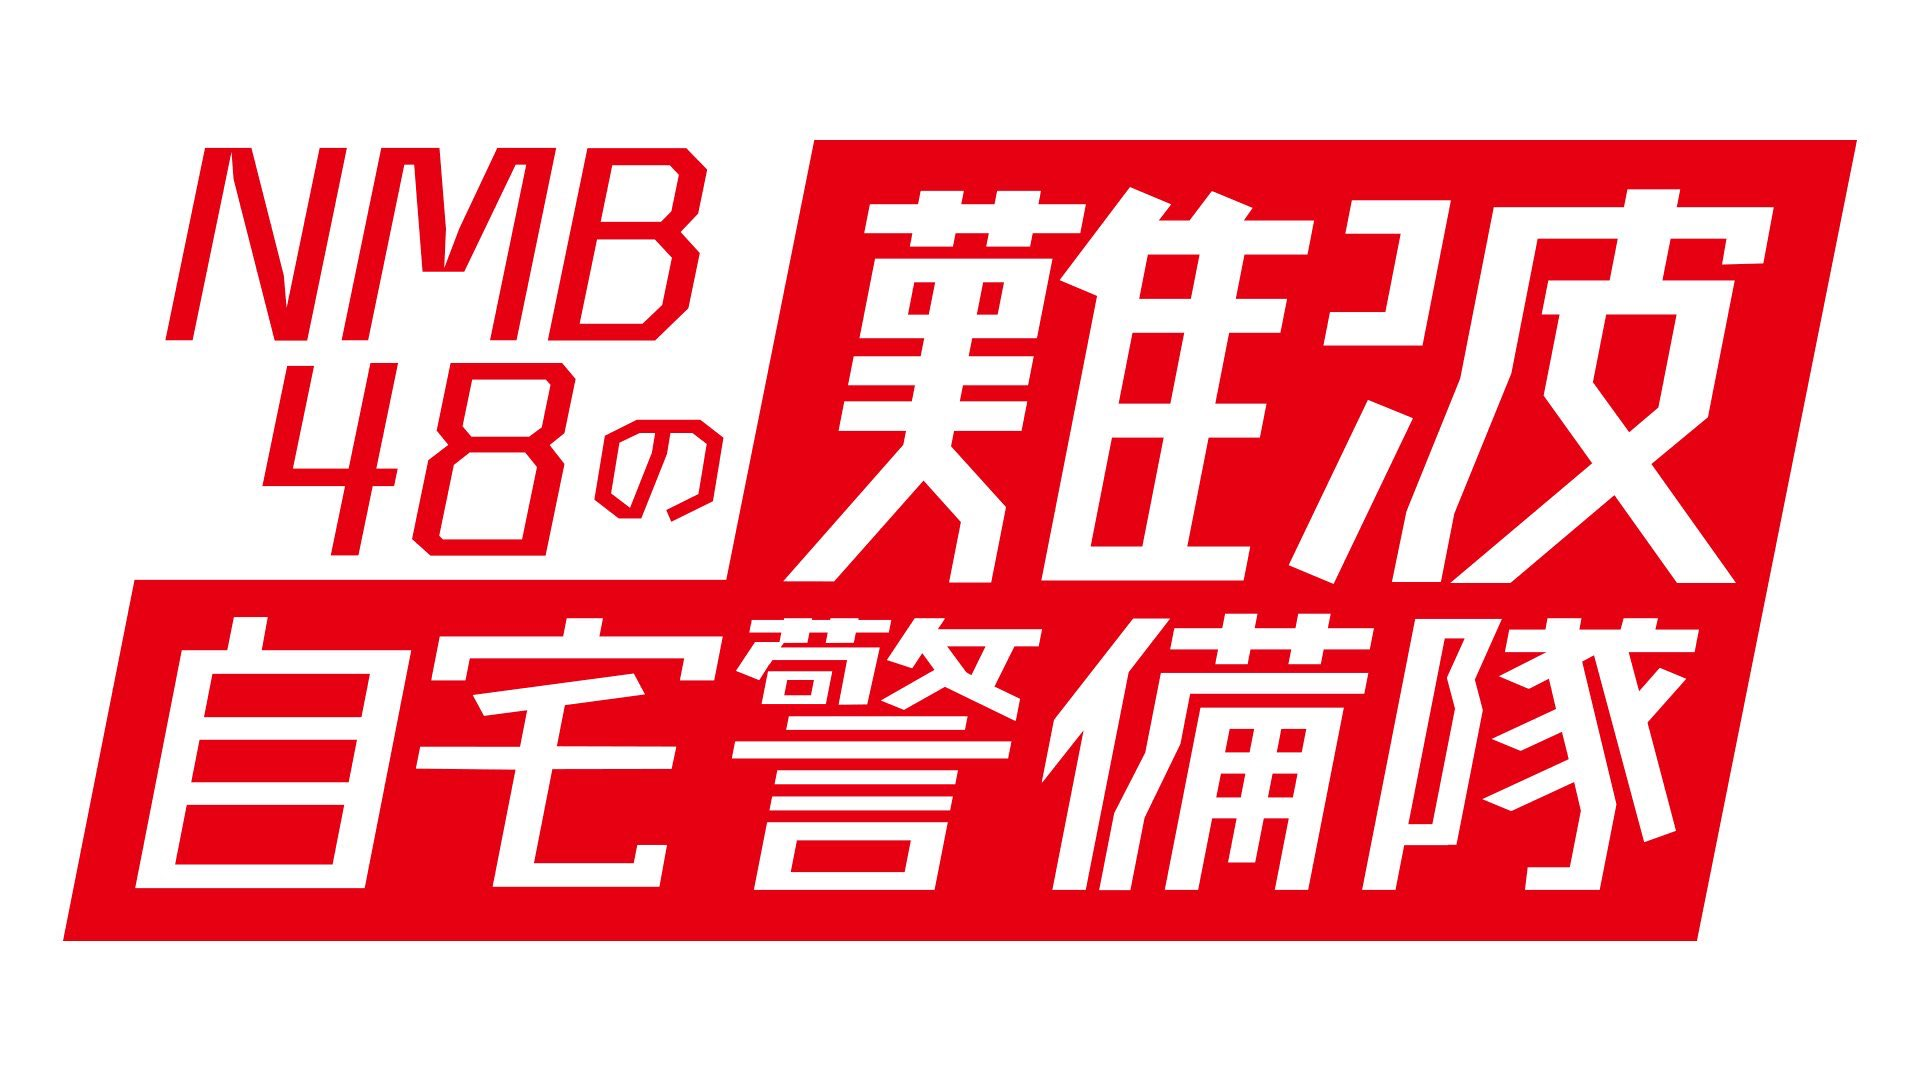 【NMB48】難波自宅警備隊「EX大衆公開オンライン対談」渋谷凪咲が大愚元勝住職と対談